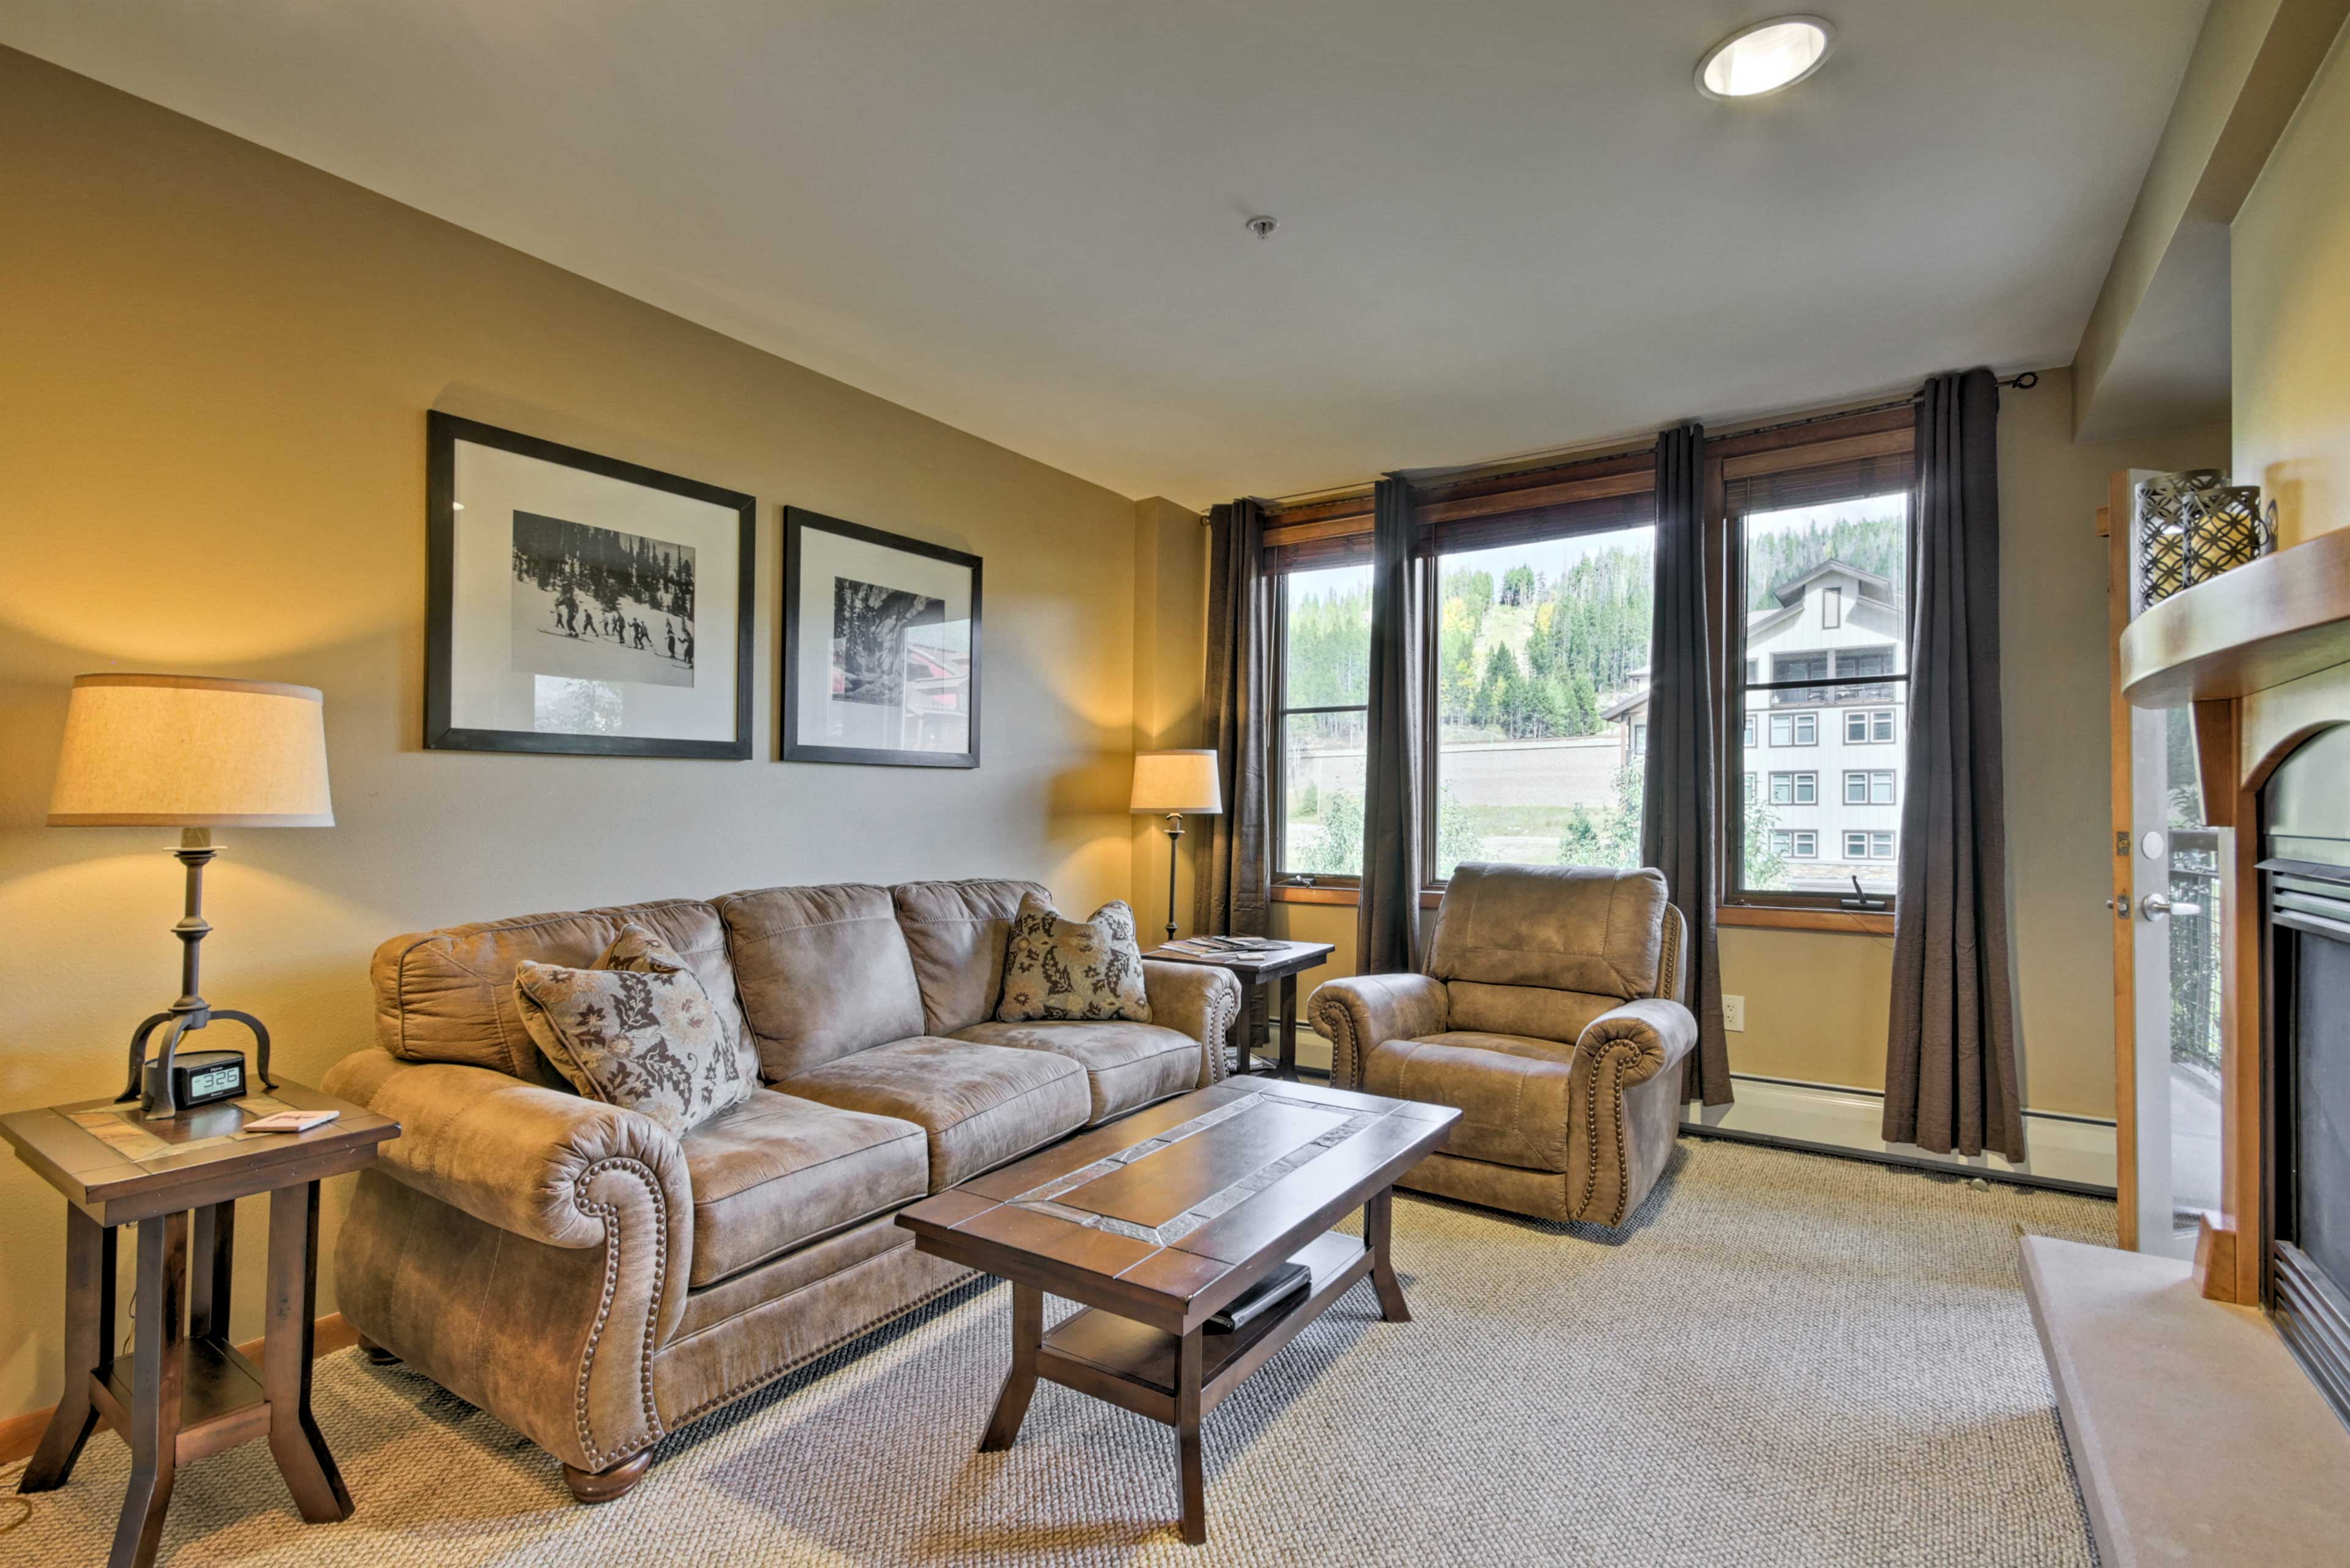 Living Room | Sleeper Sofa | Free WiFi | Central Heating